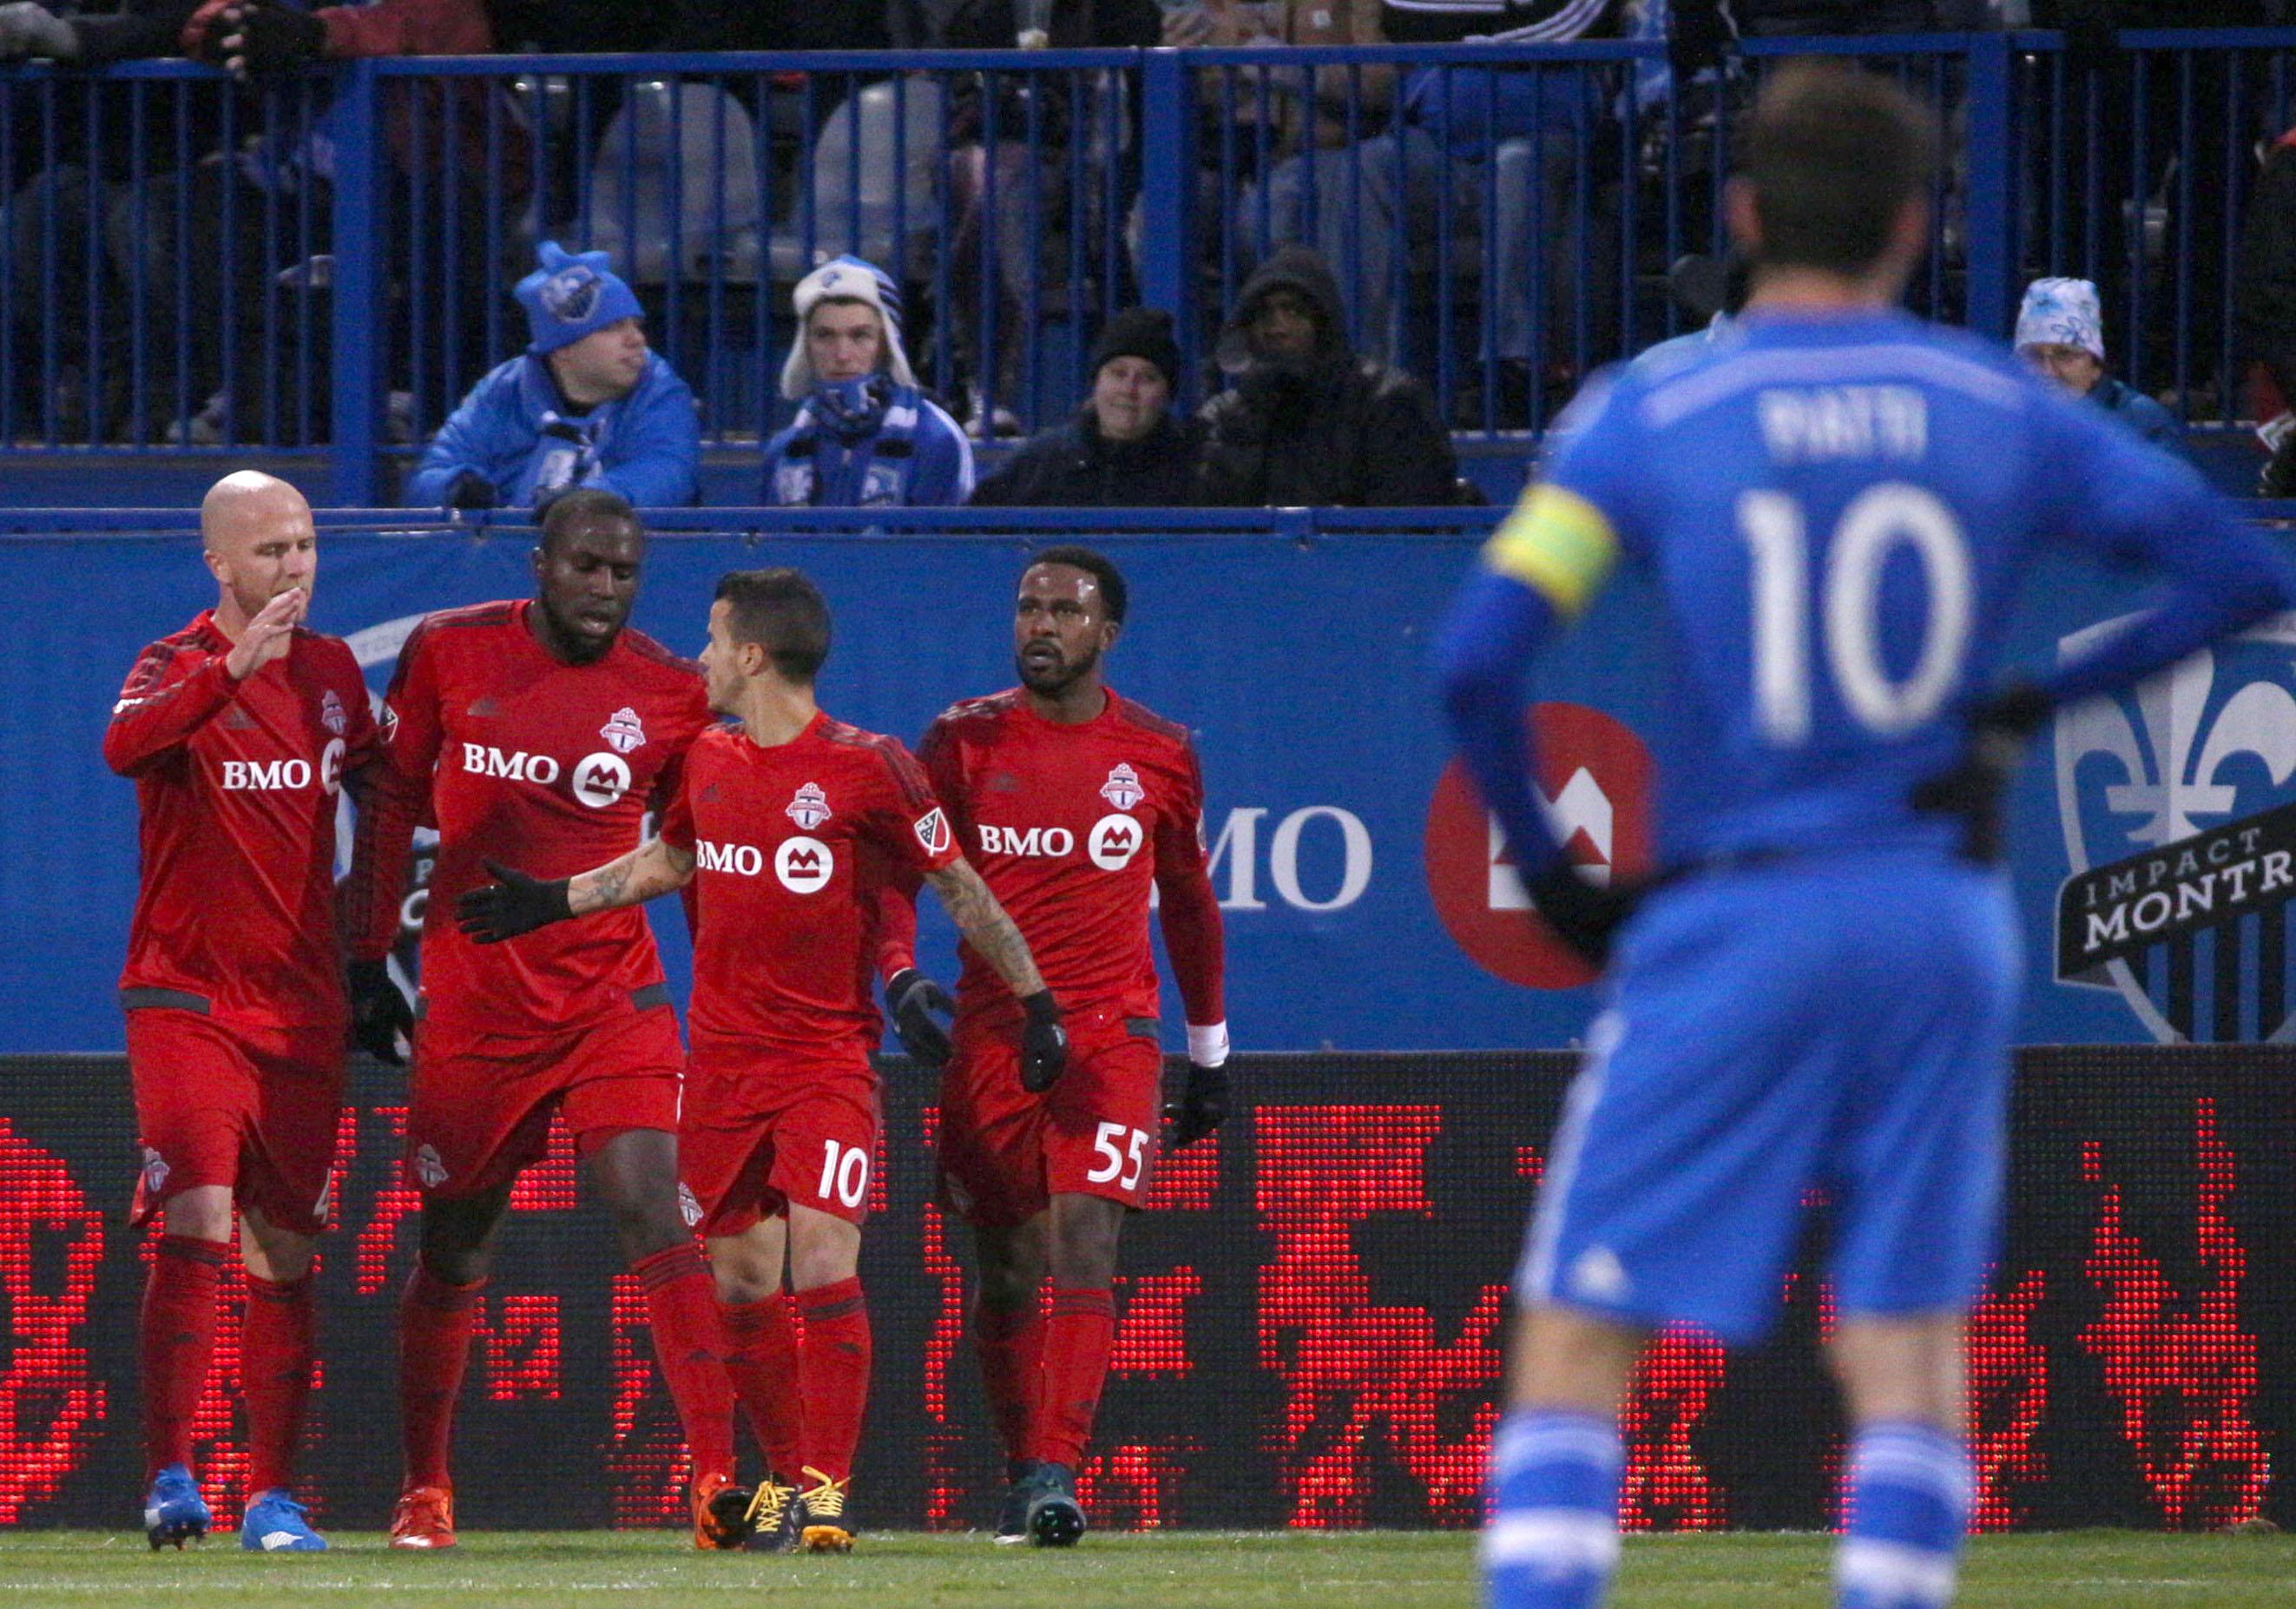 Ignacio Piatti watching Toronto's 3 DPs celebrate a goal last Sunday. The same DPs the Impact will have to slow down tomorrow.